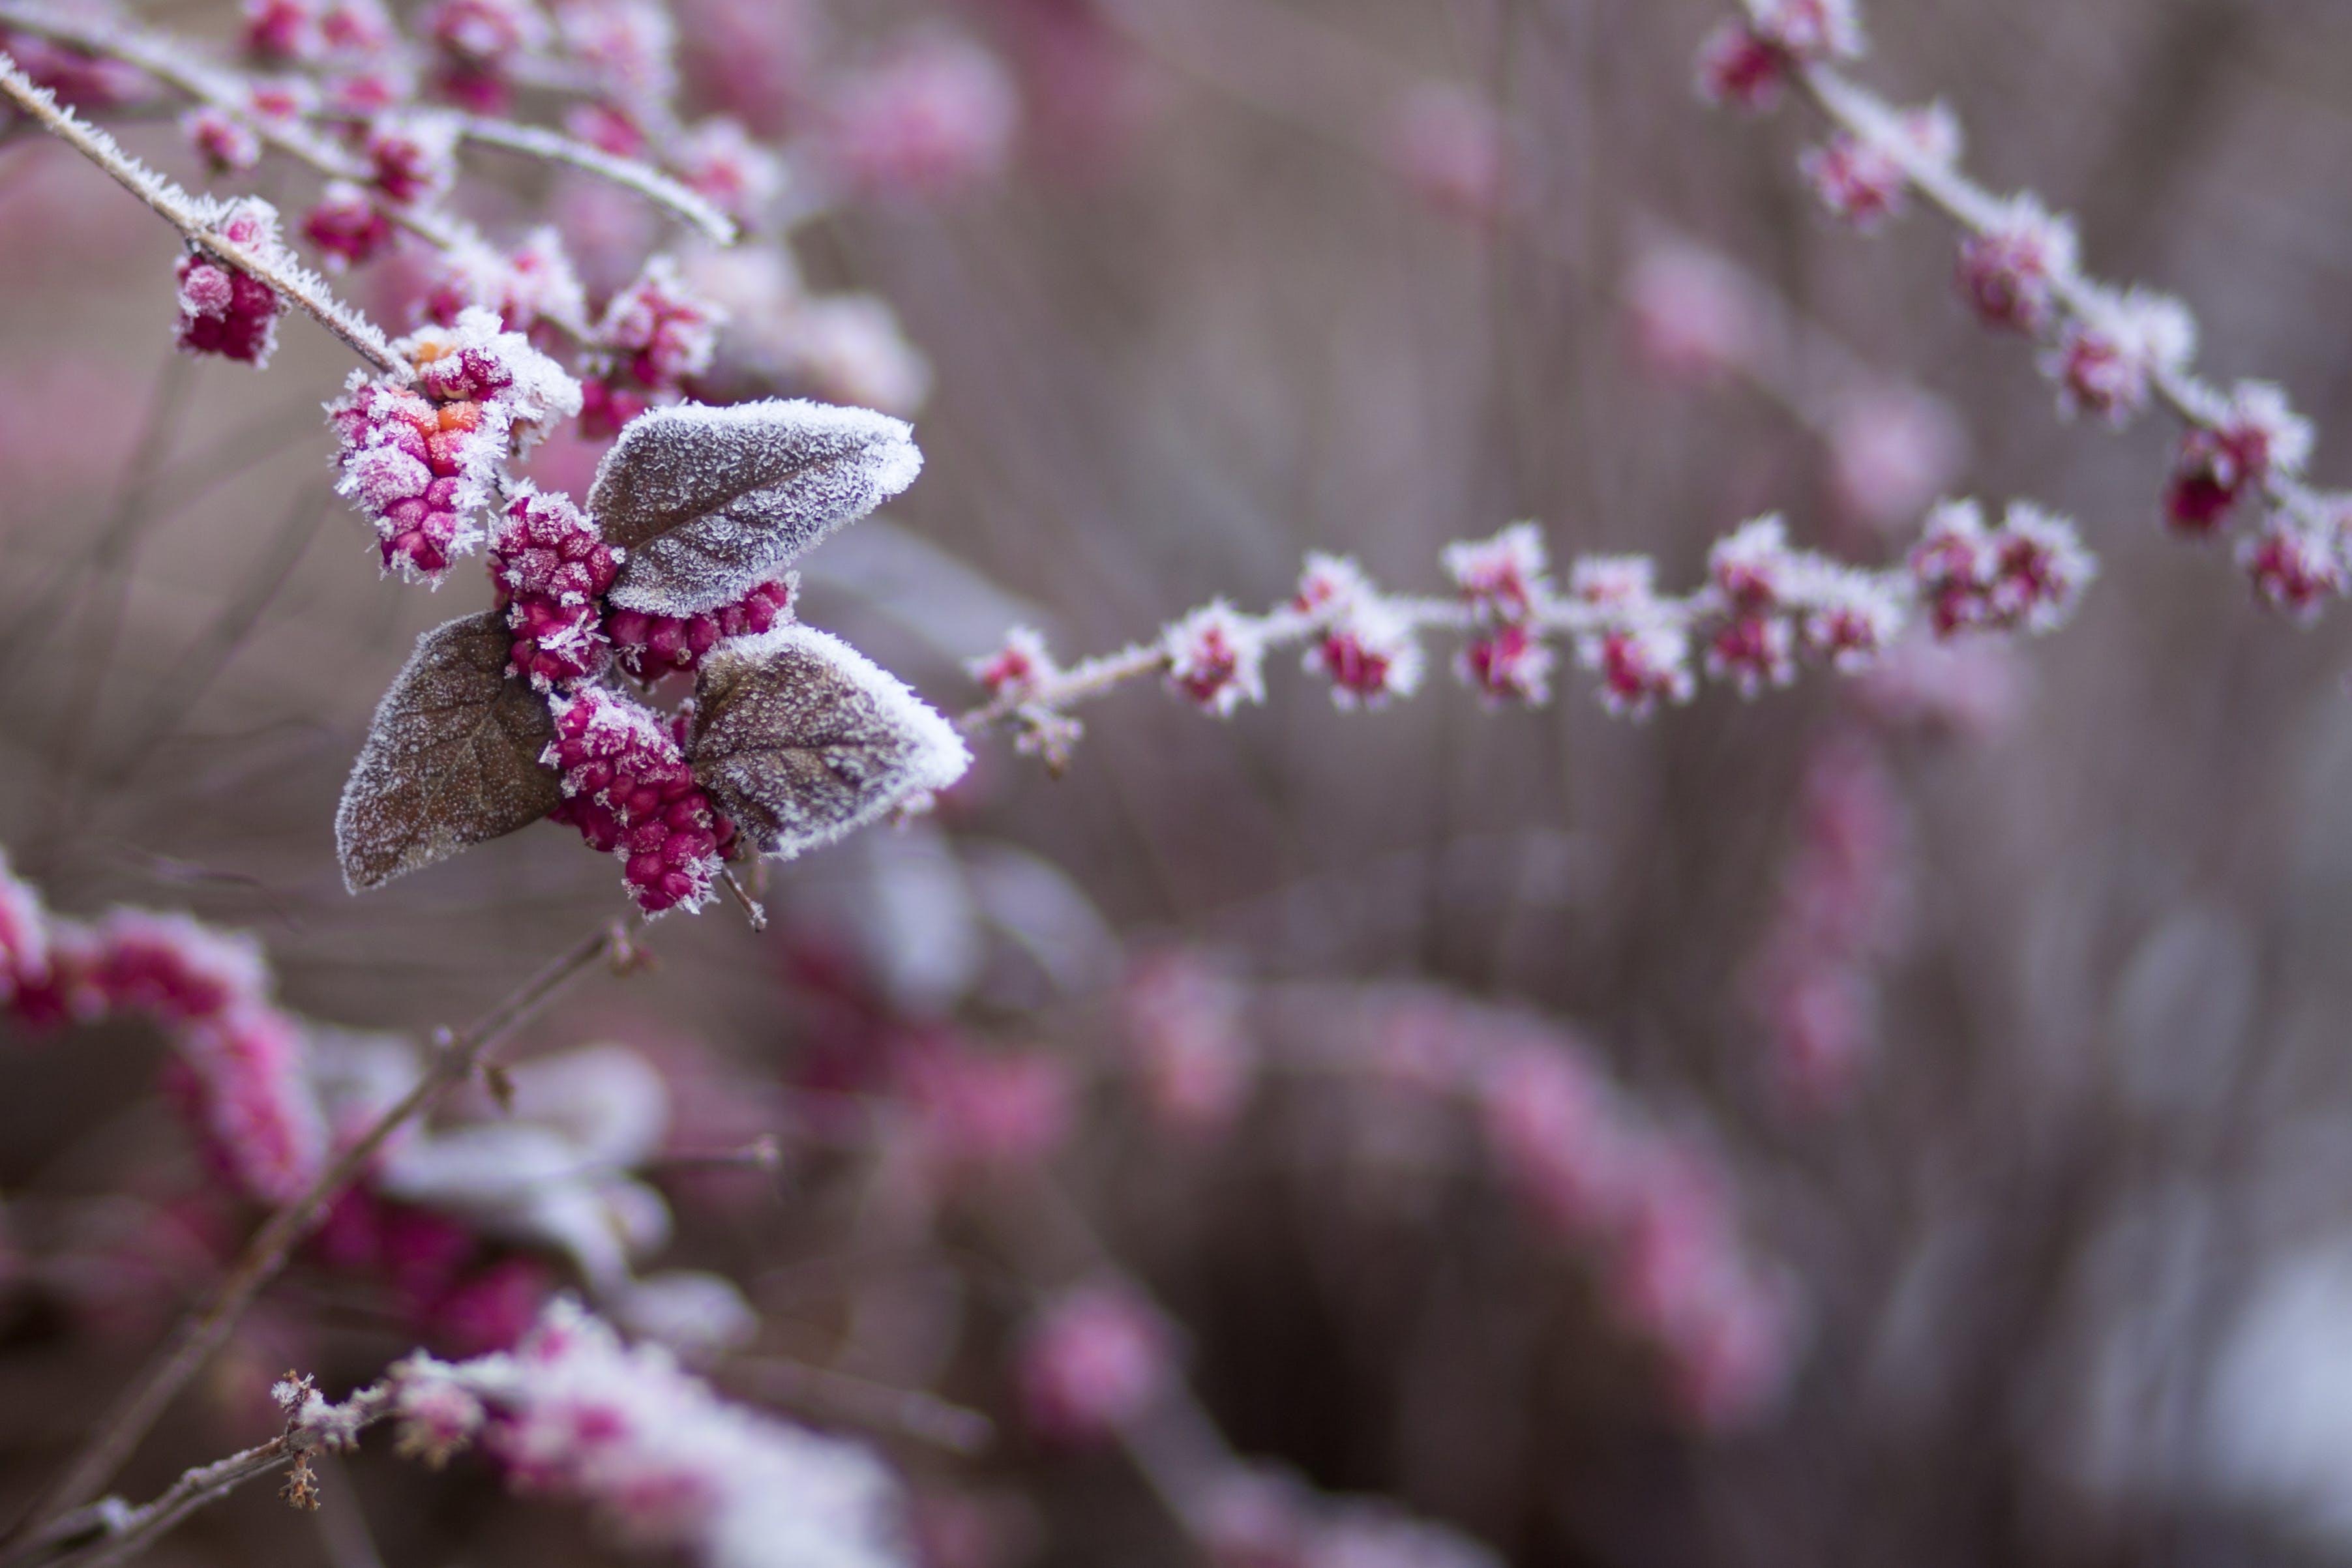 Gratis arkivbilde med årstid, bær, farger, frosset